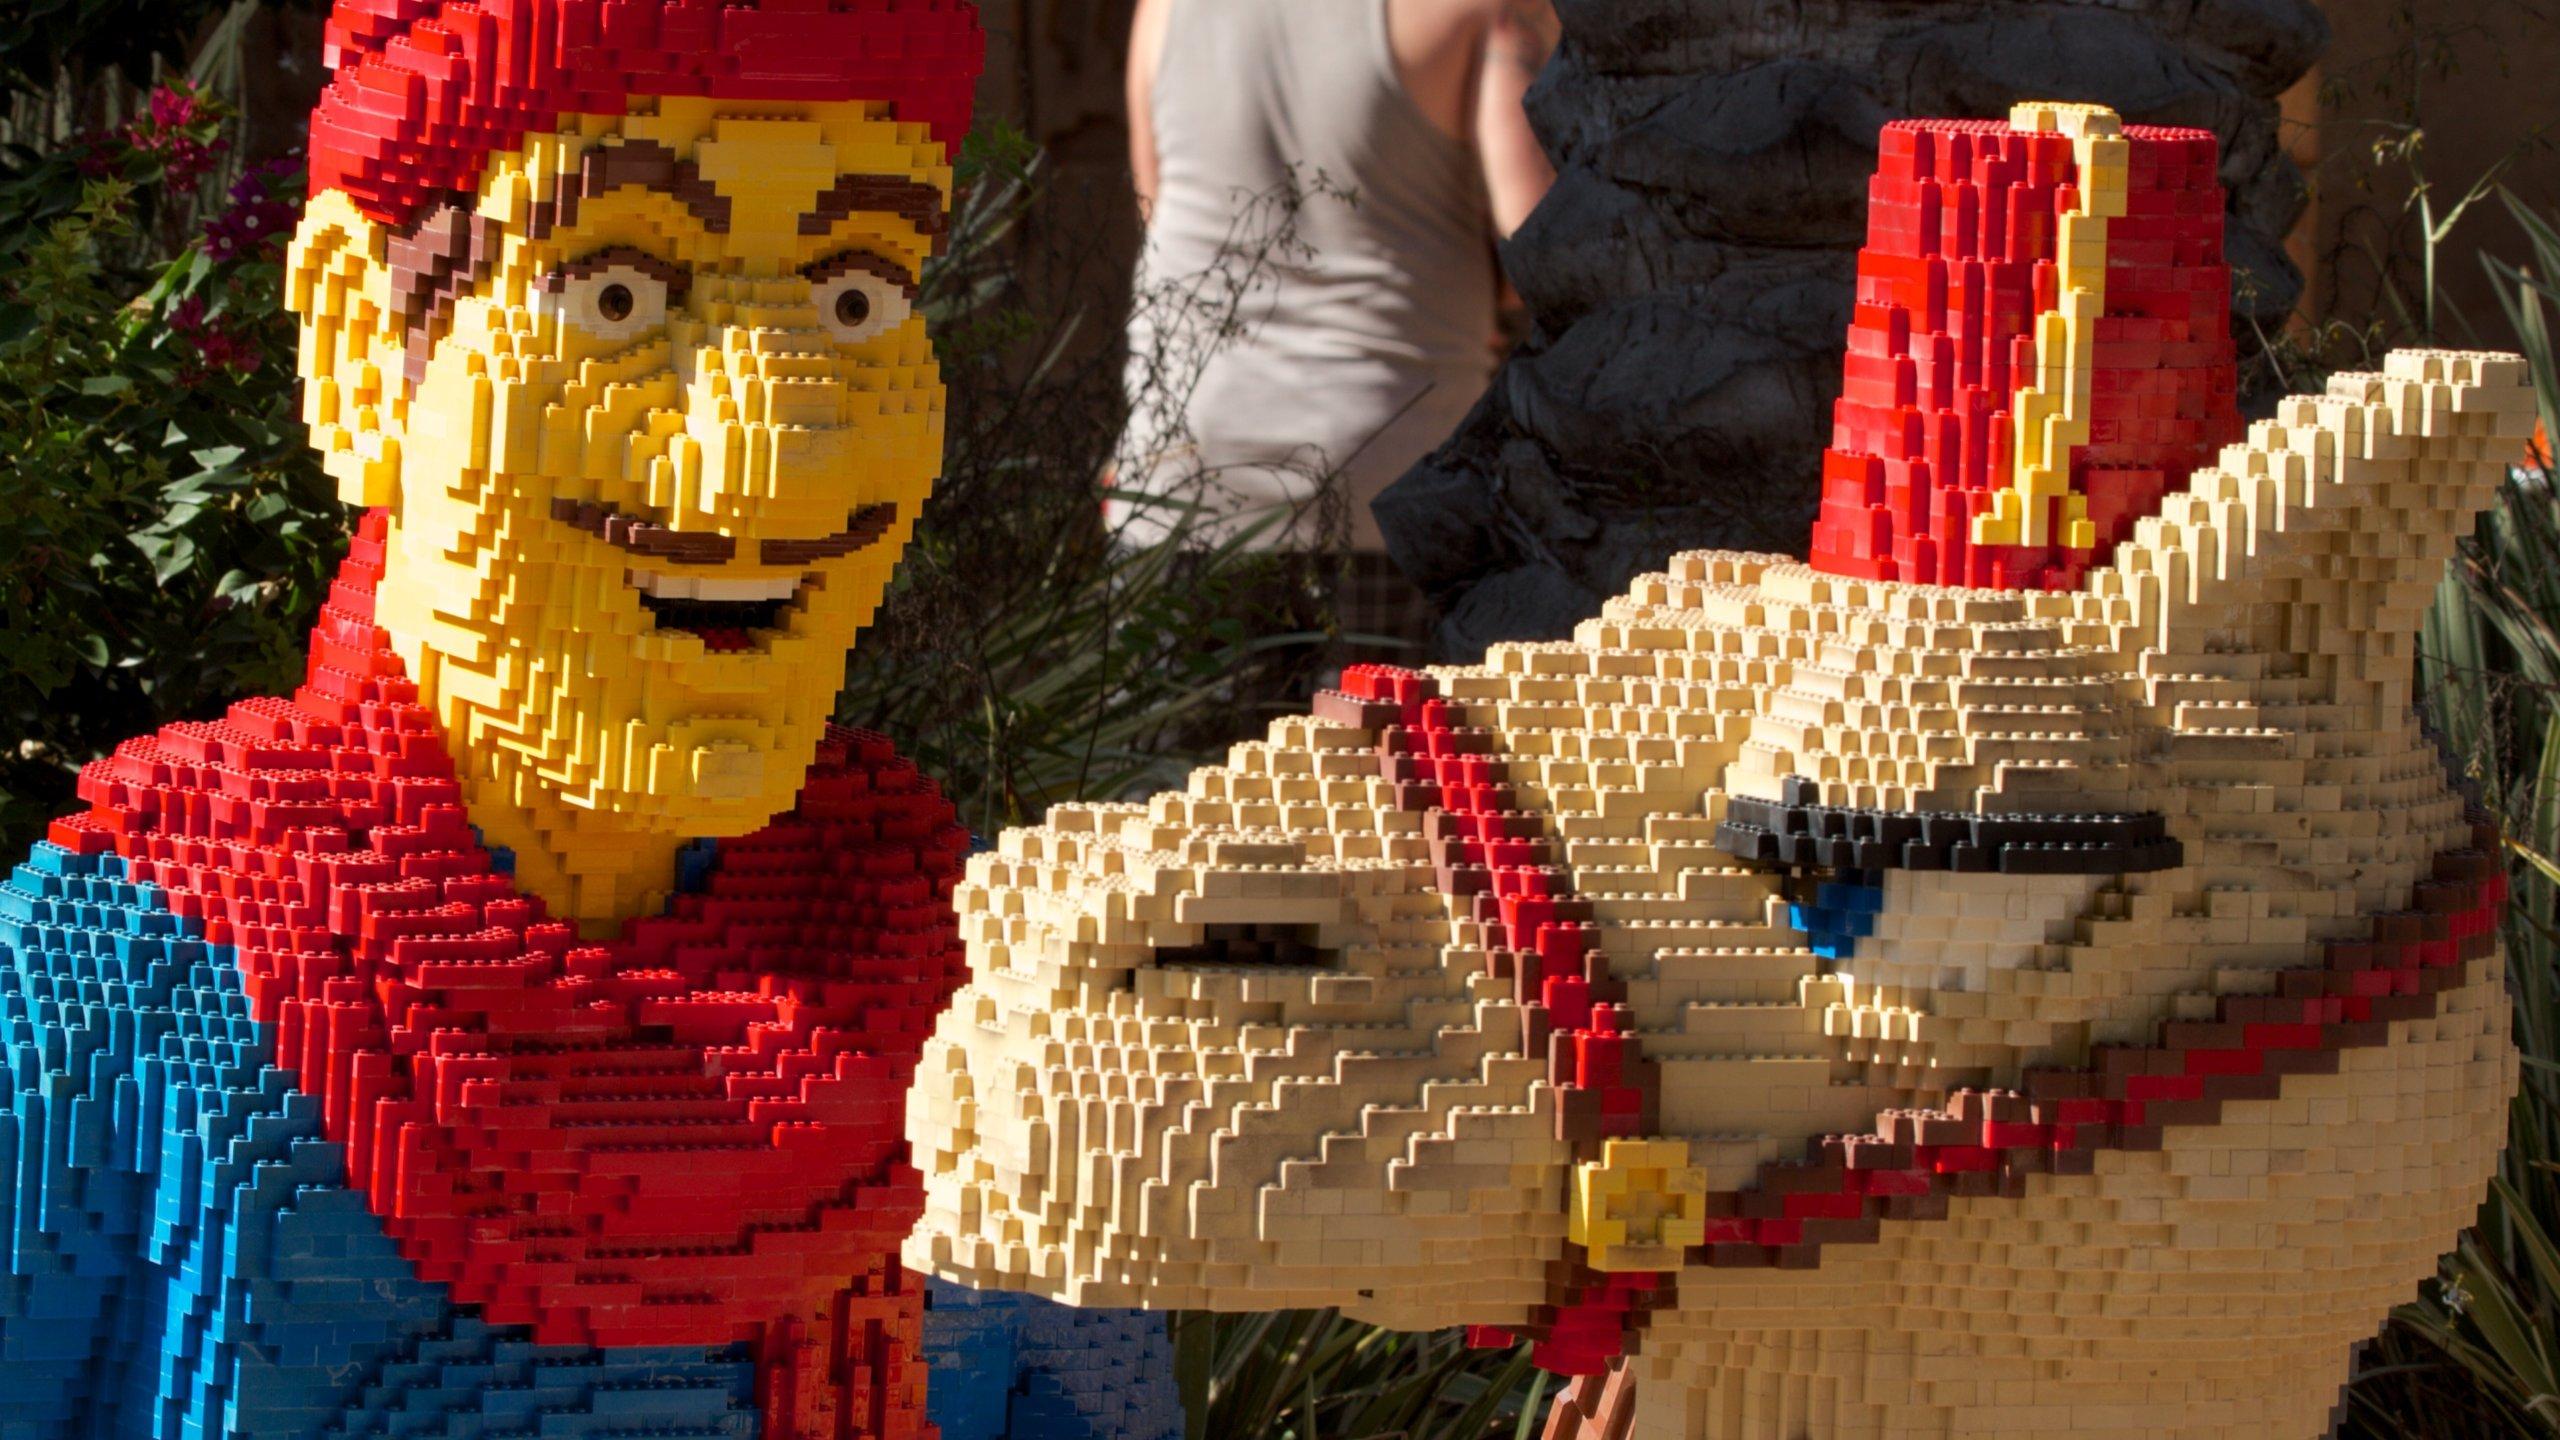 Legoland California, Carlsbad, California, United States of America